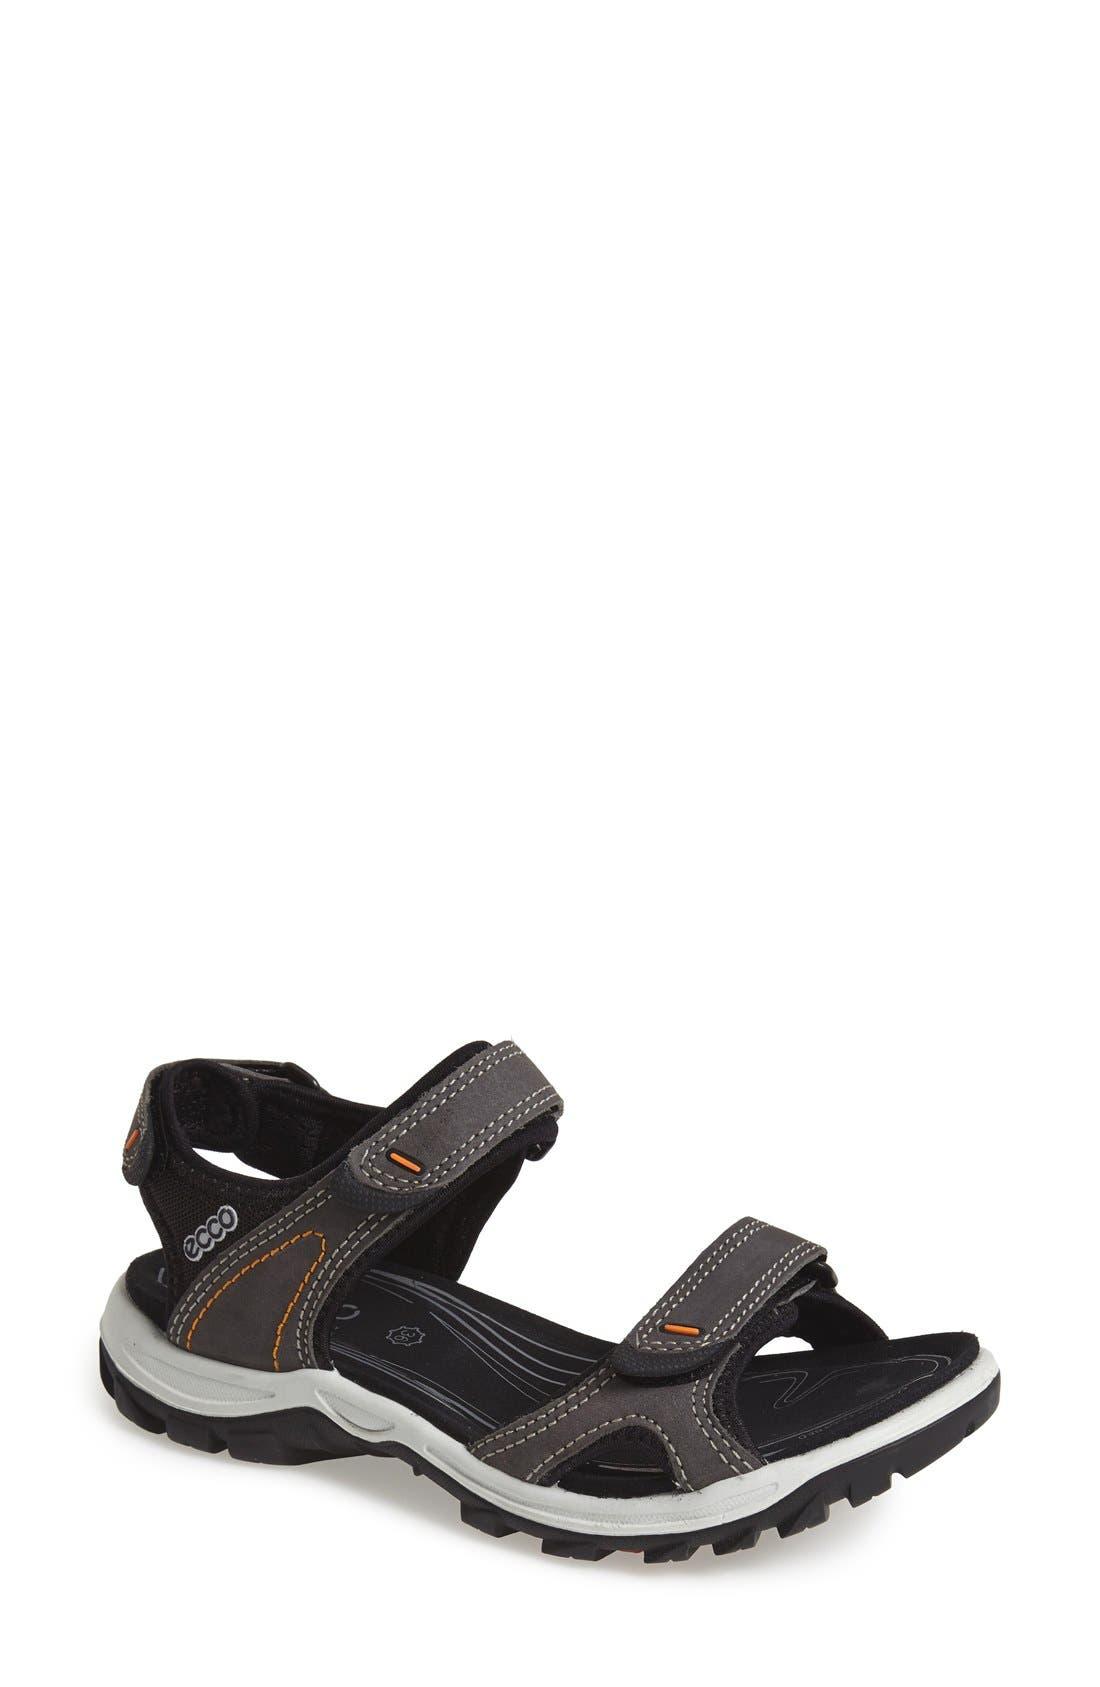 'Offroad' Lightweight Sandal,                         Main,                         color,